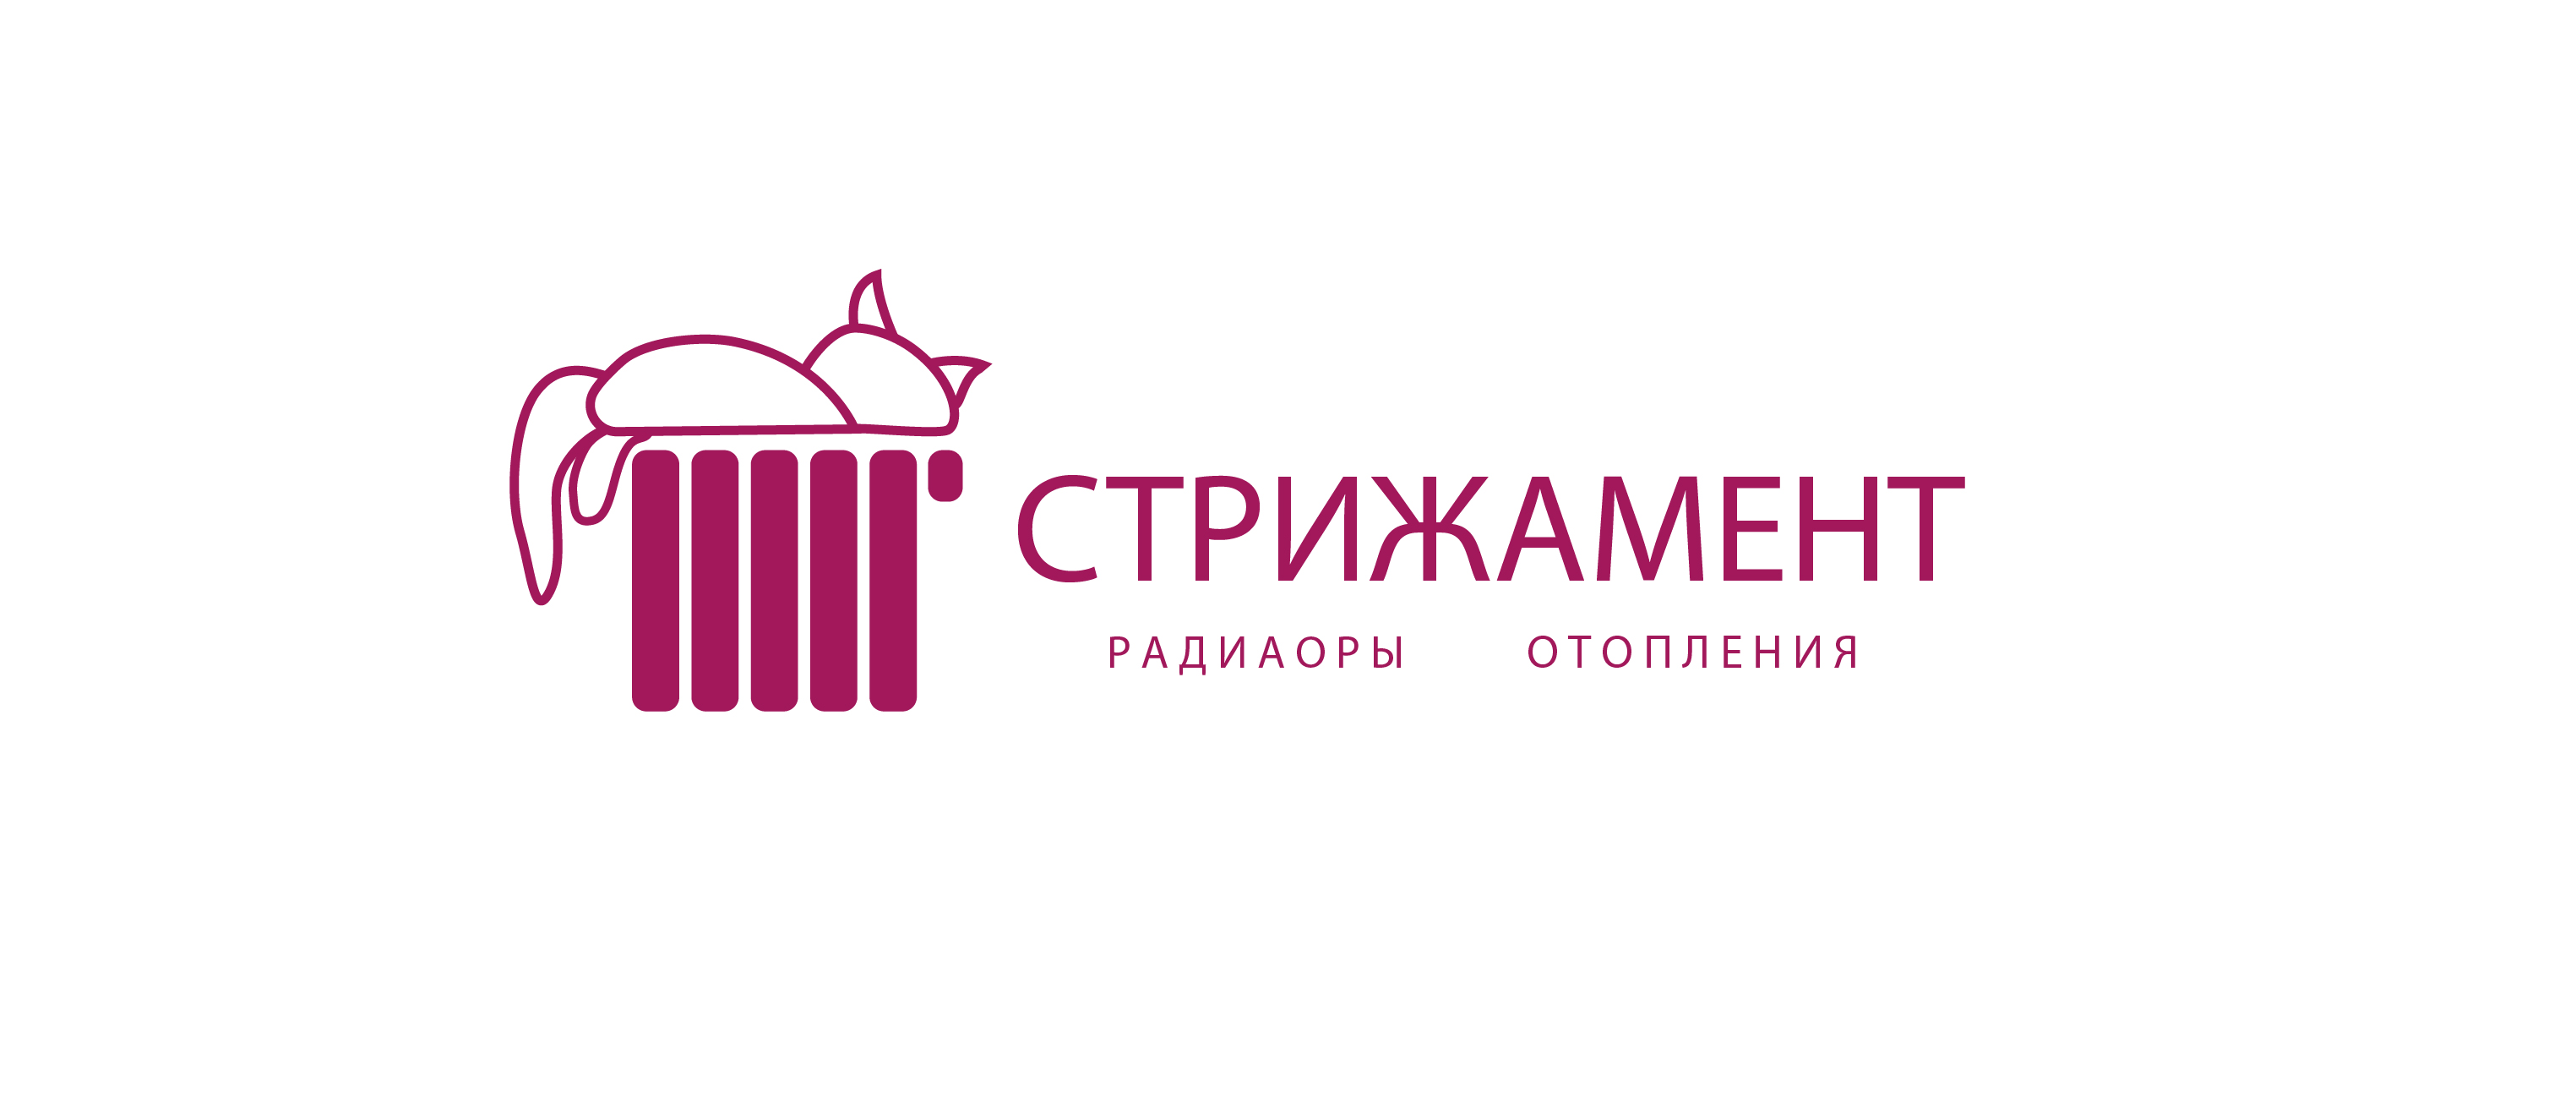 Дизайн лого бренда фото f_1555d503cc9c96c1.jpg